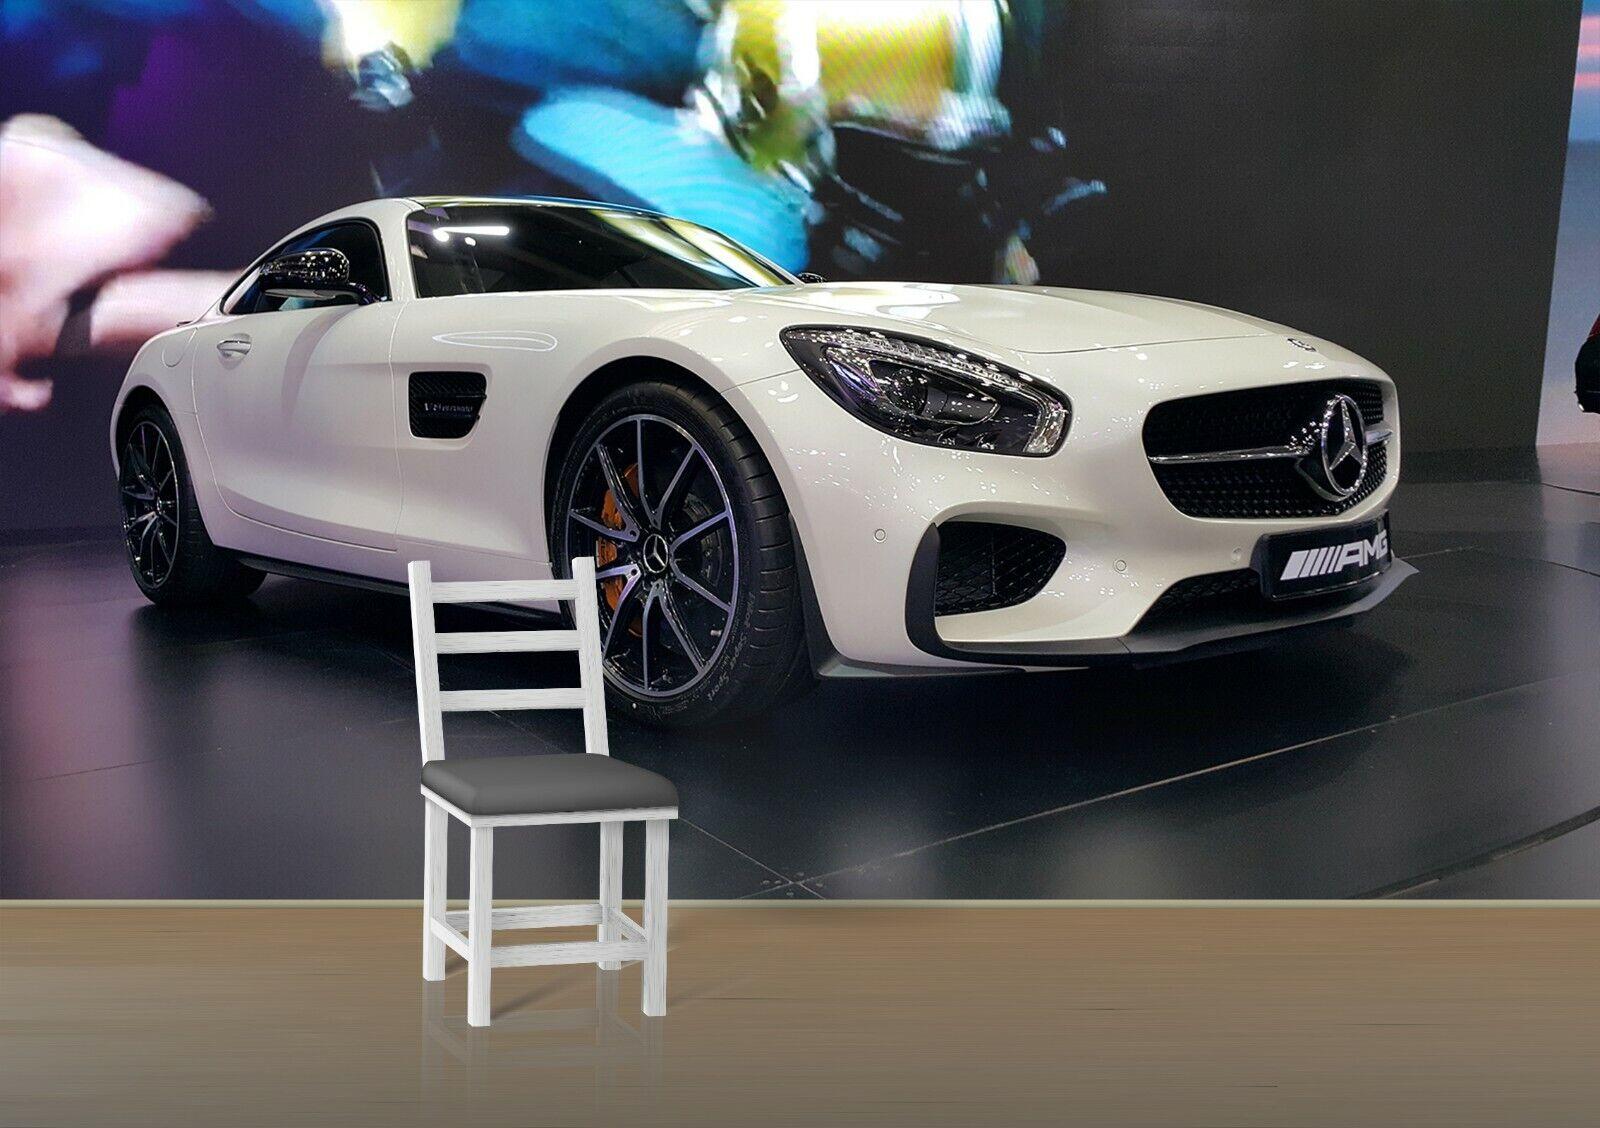 3D Mercedes Sports Car I26 Transport WandPapier Mural Sefl-adhesive Removable An